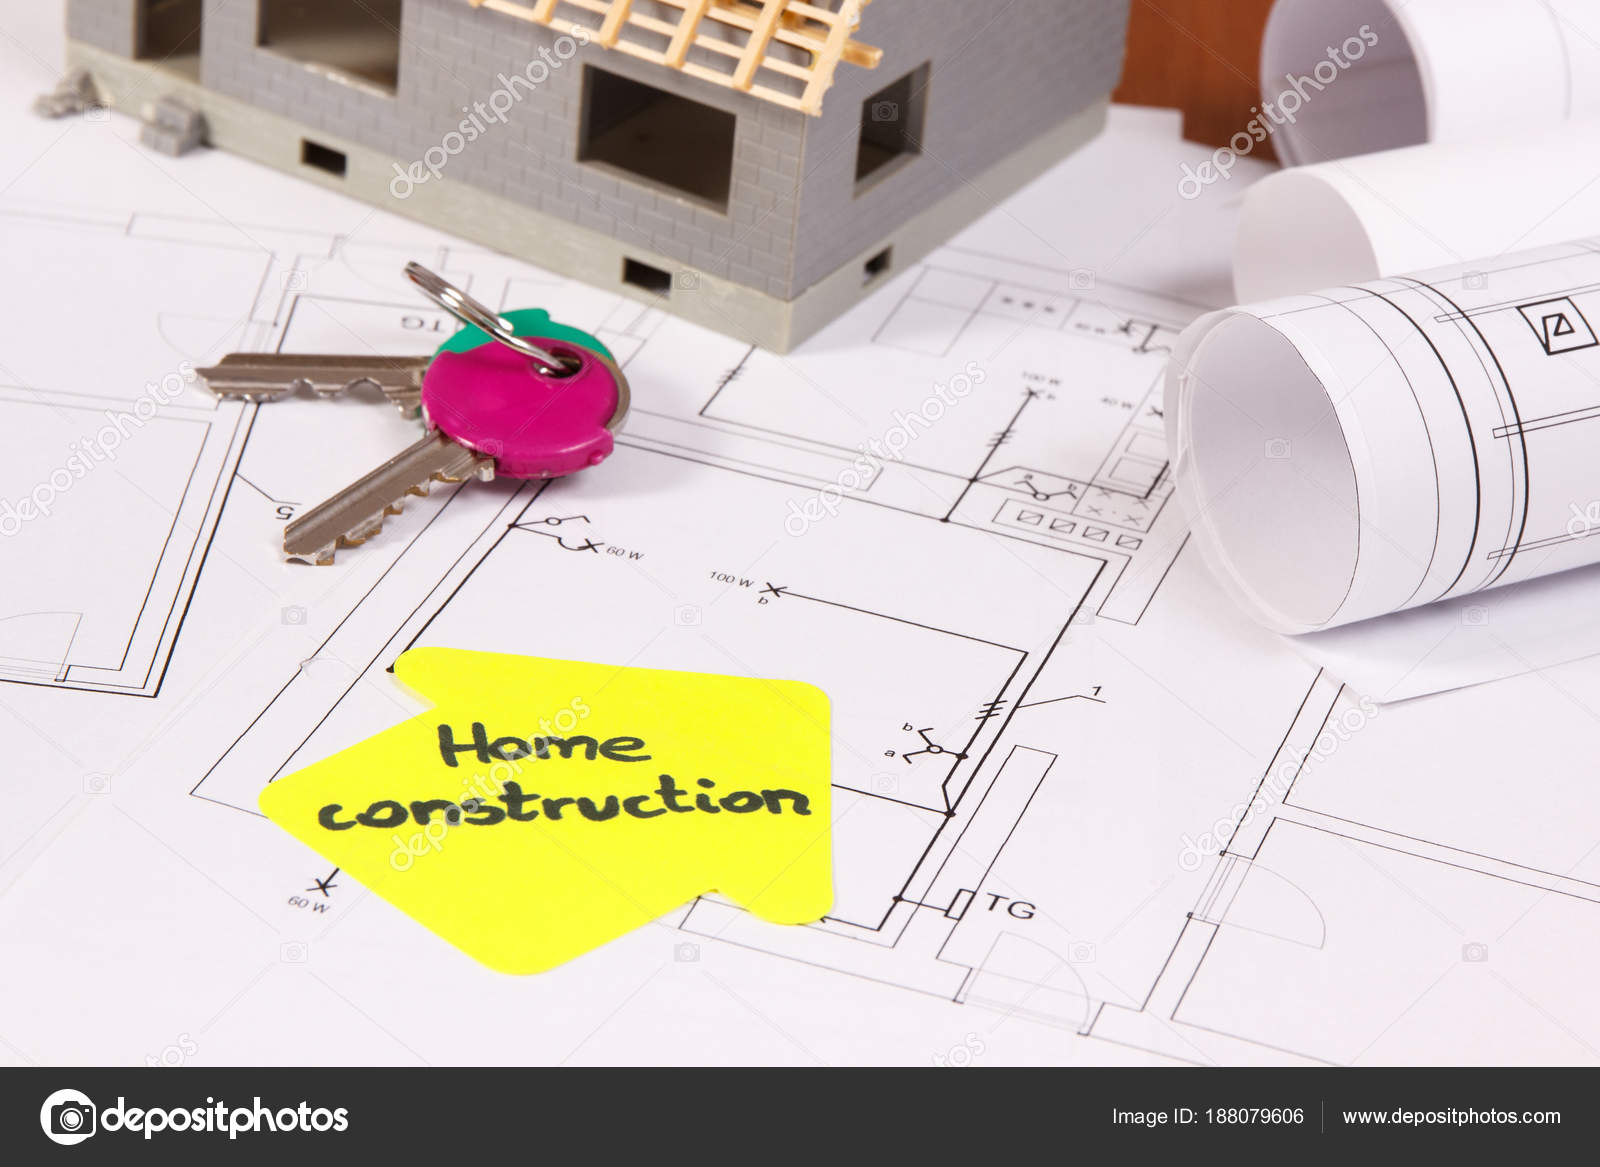 Schemi Elettrici Casa : Chiavi di casa casa in costruzione e schemi elettrici per lavori